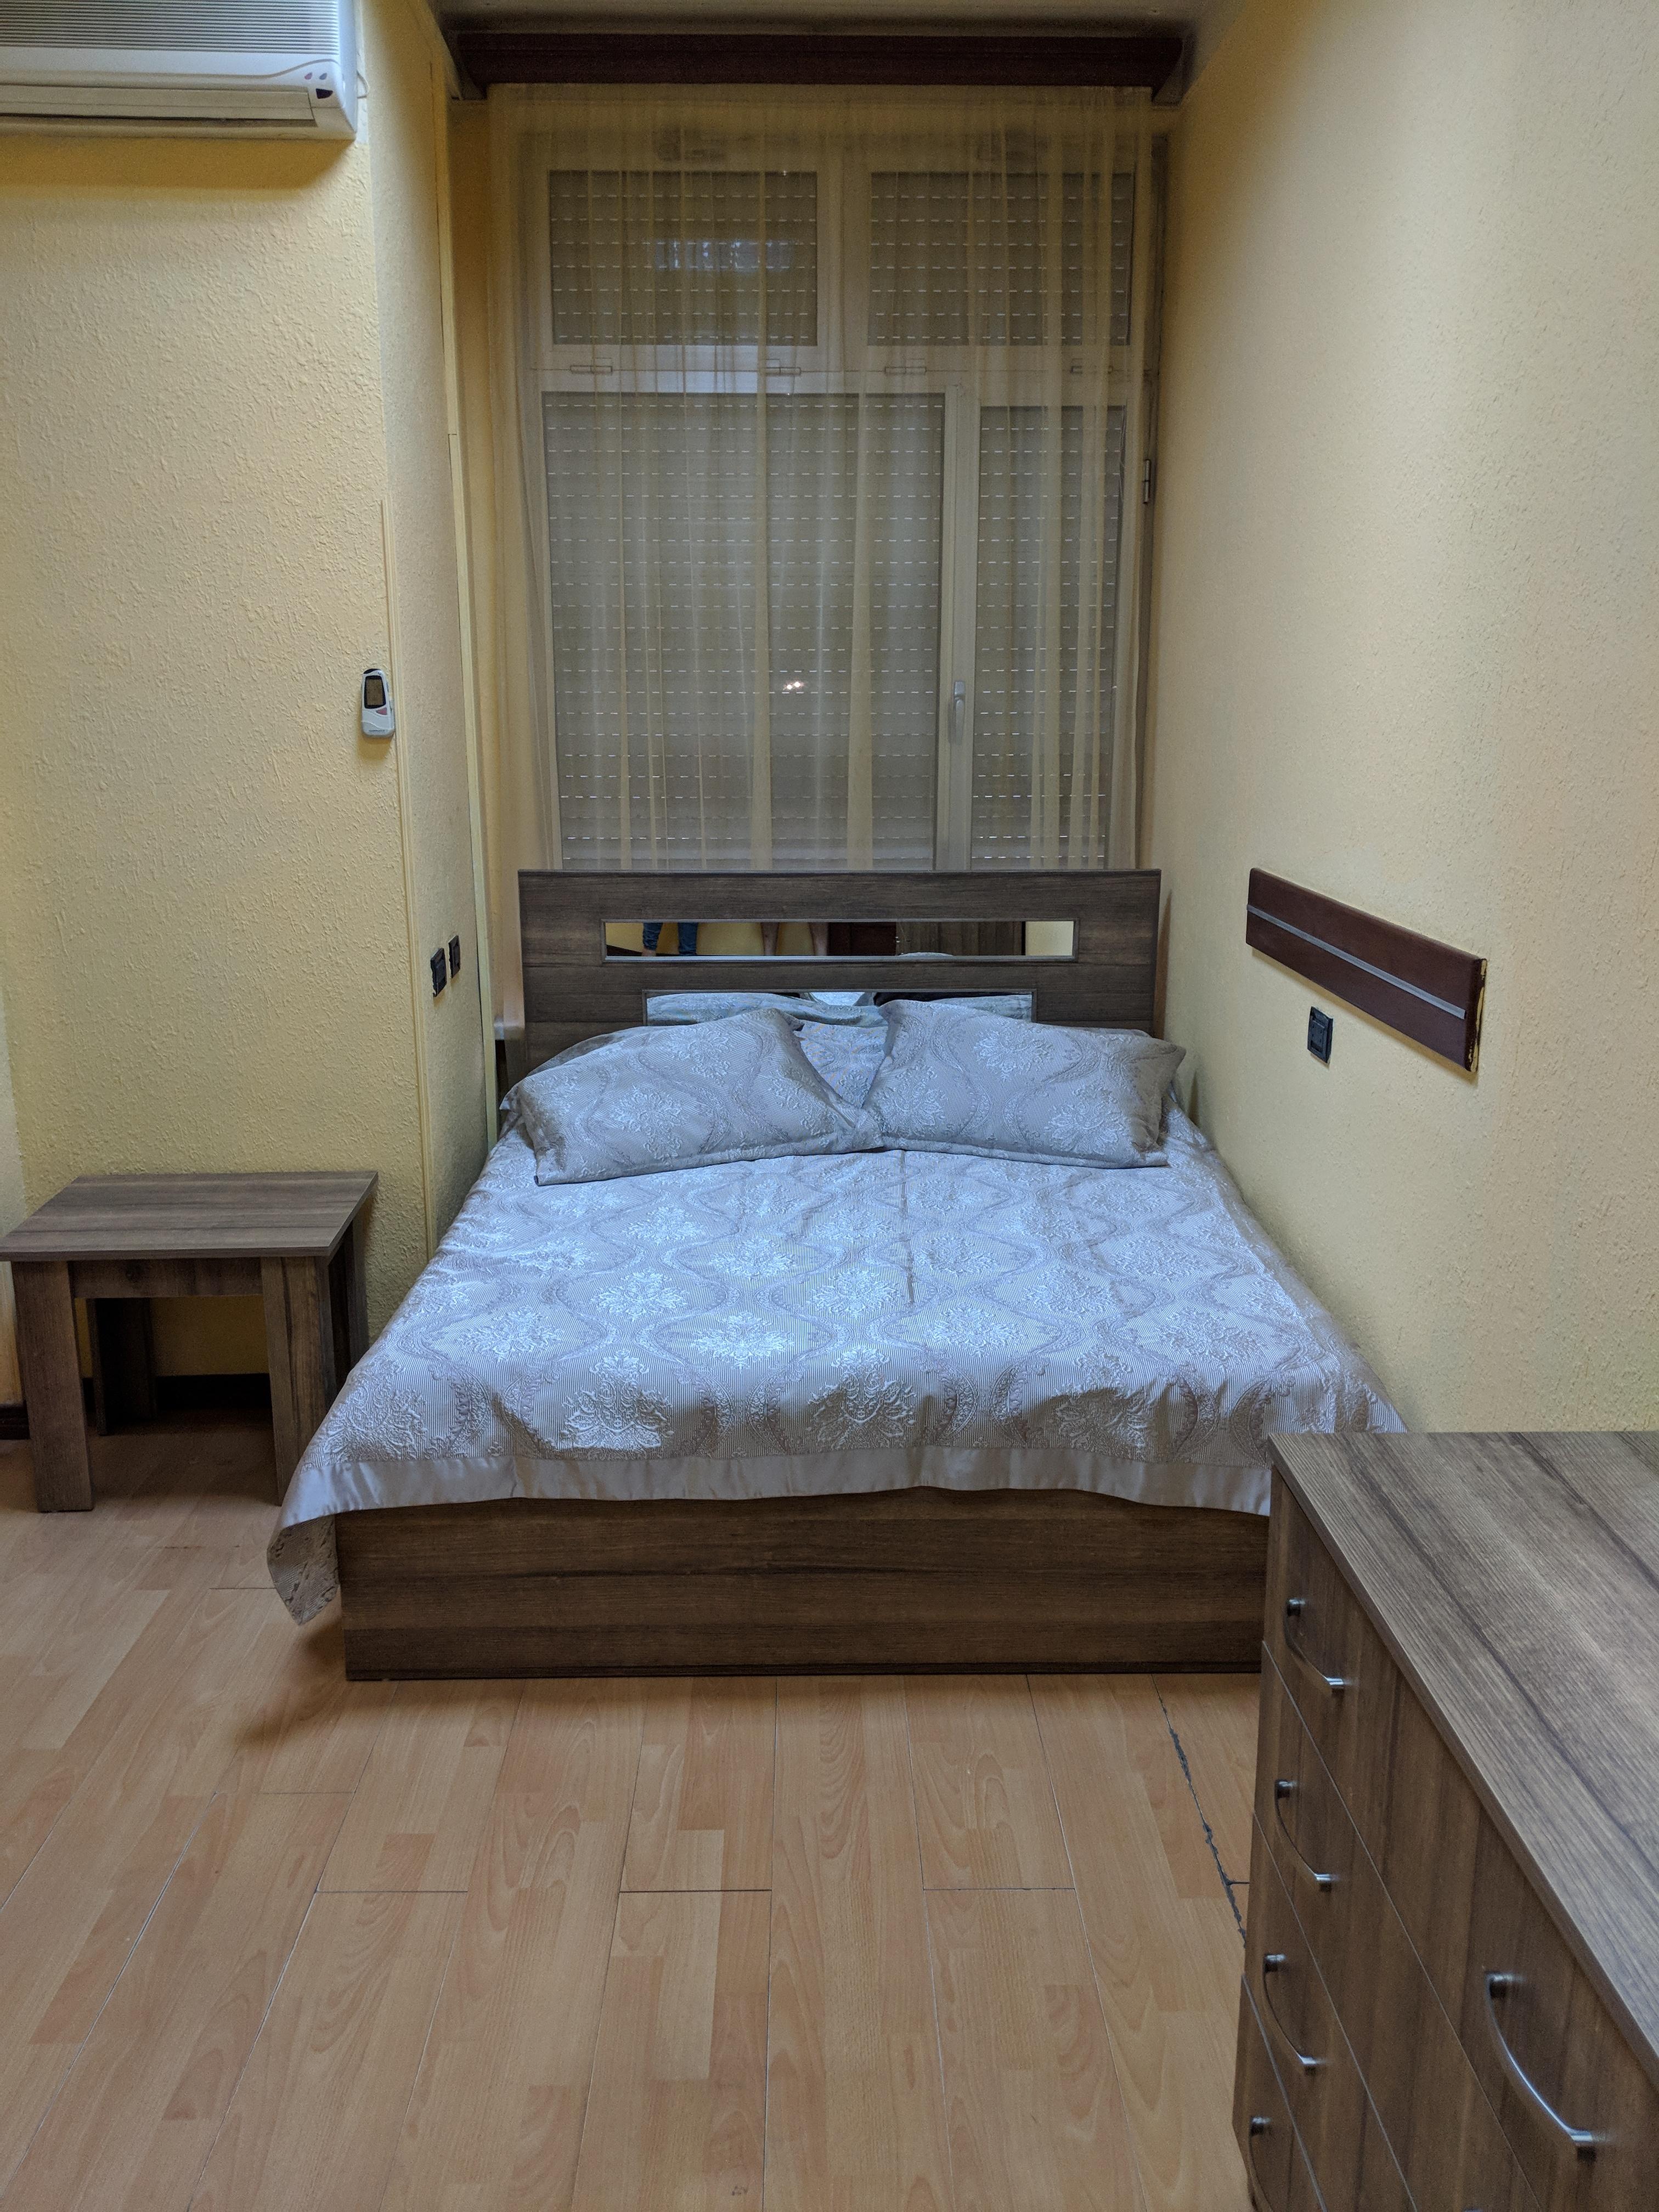 Extreme Excite Hostel Armenia